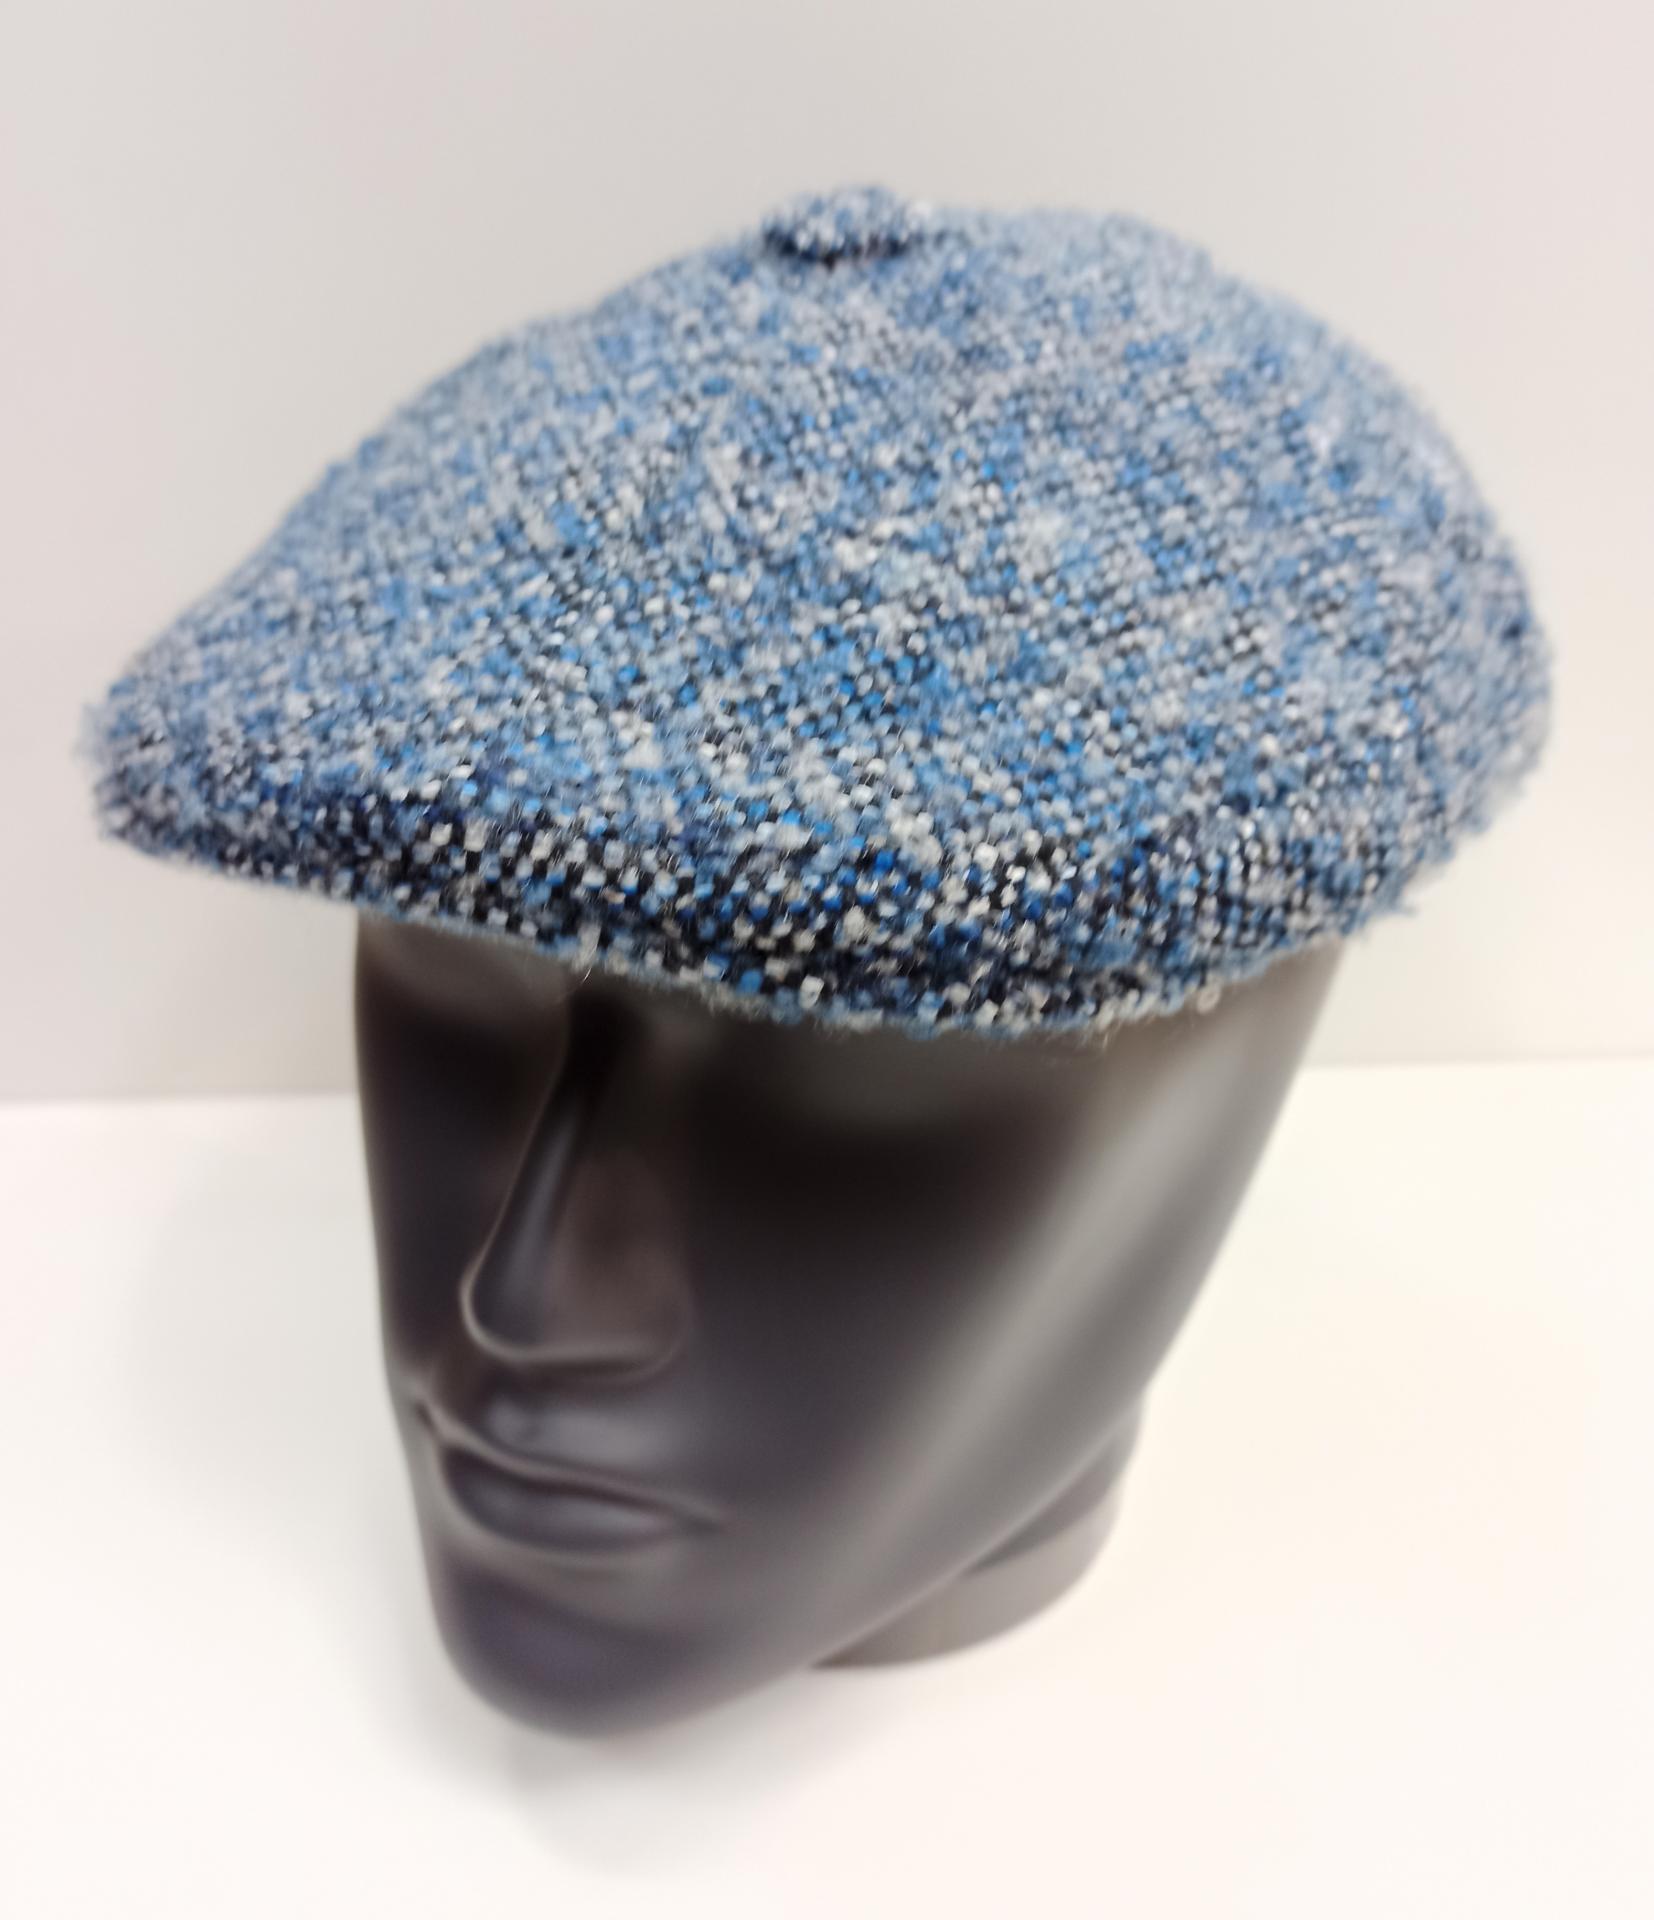 Gorra italiana azul